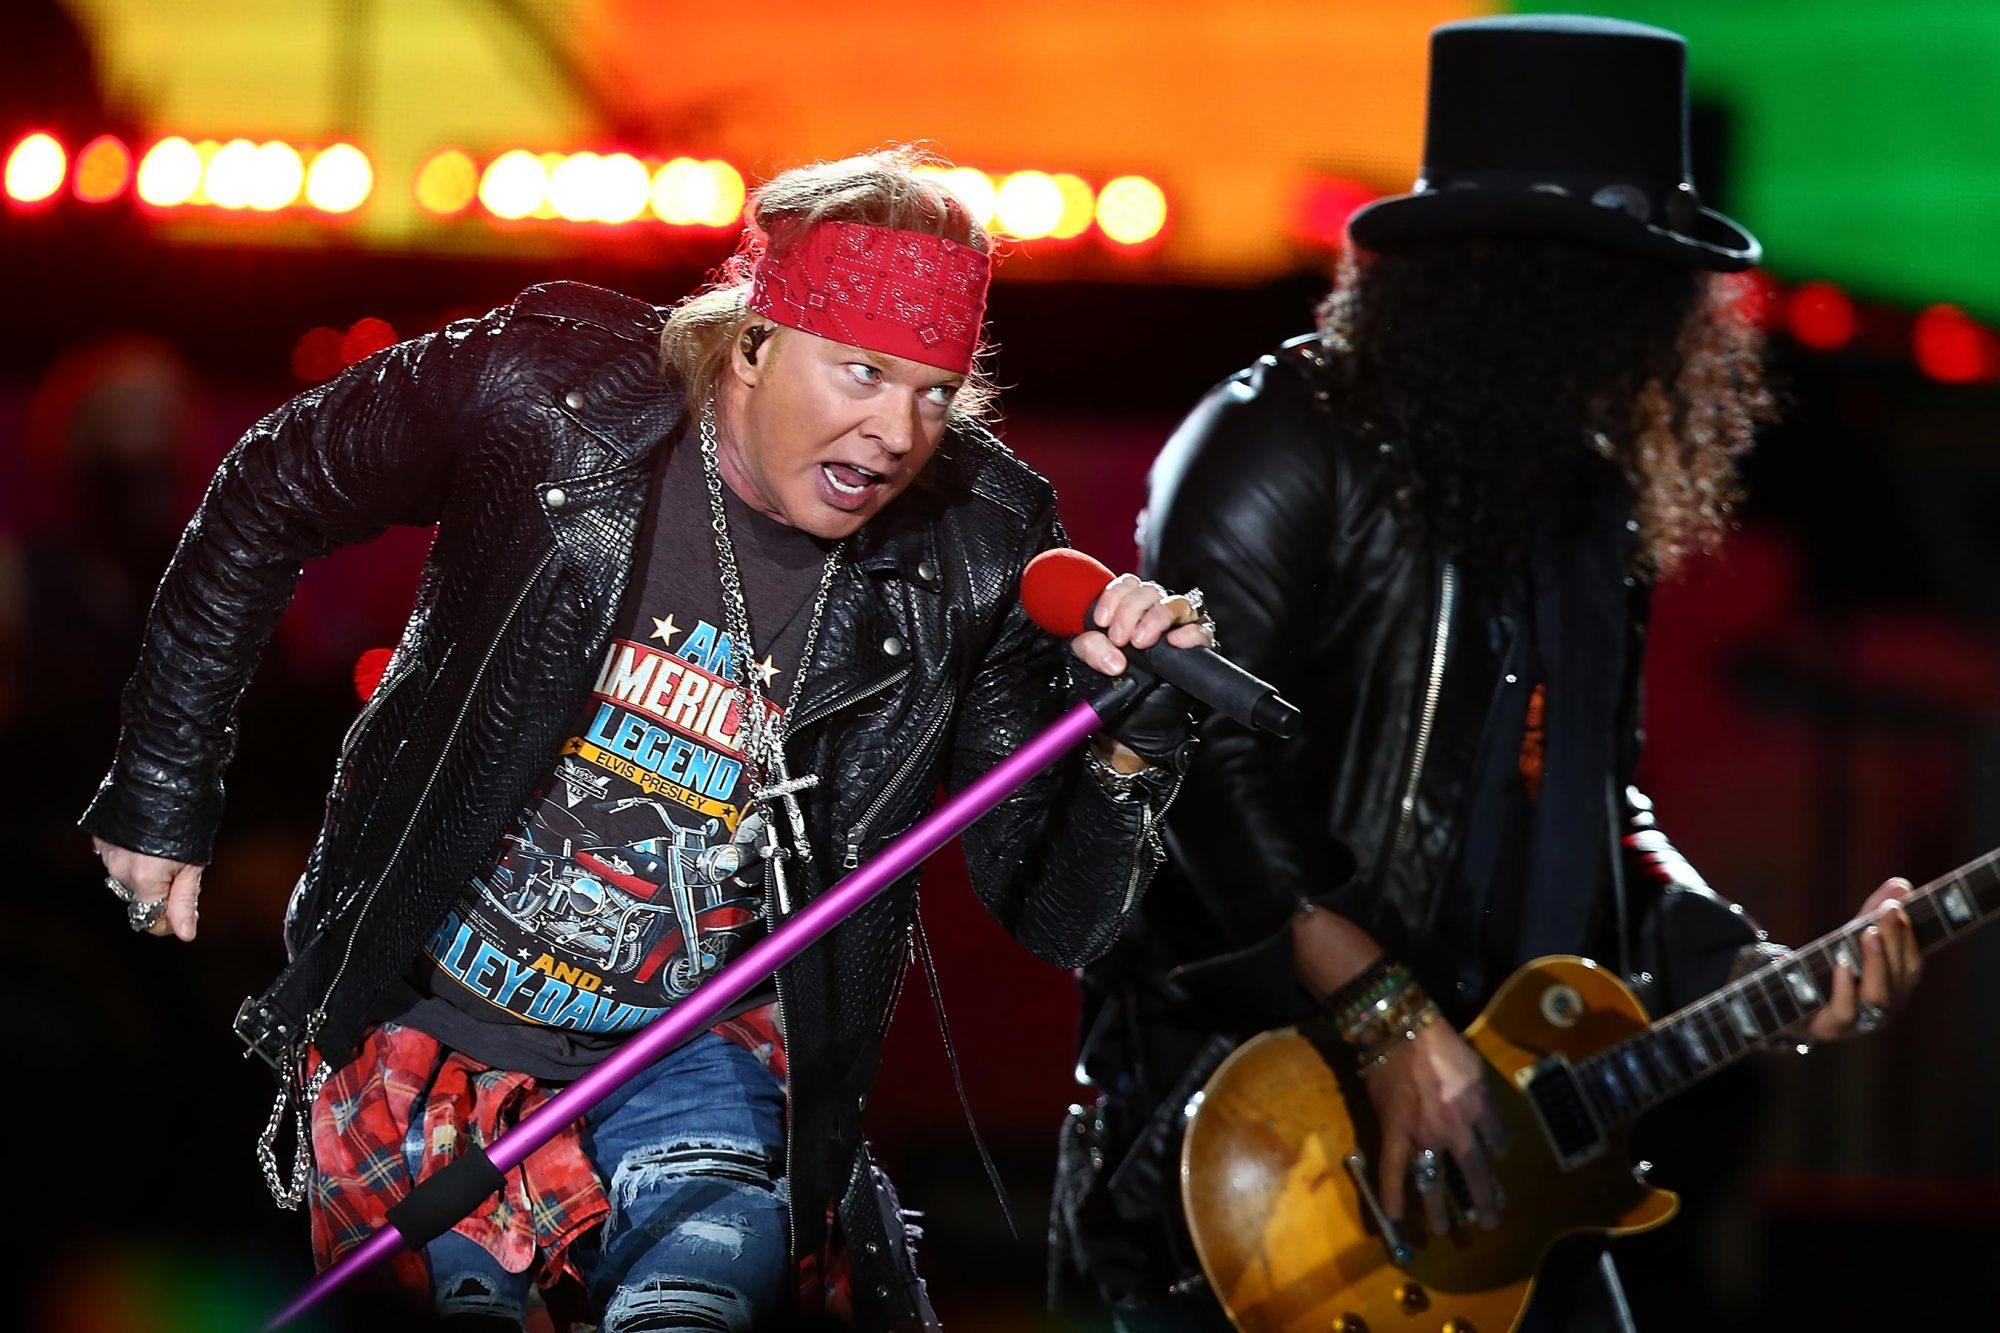 Guns 'N' Roses 'Not In This Lifetime' Tour - Perth